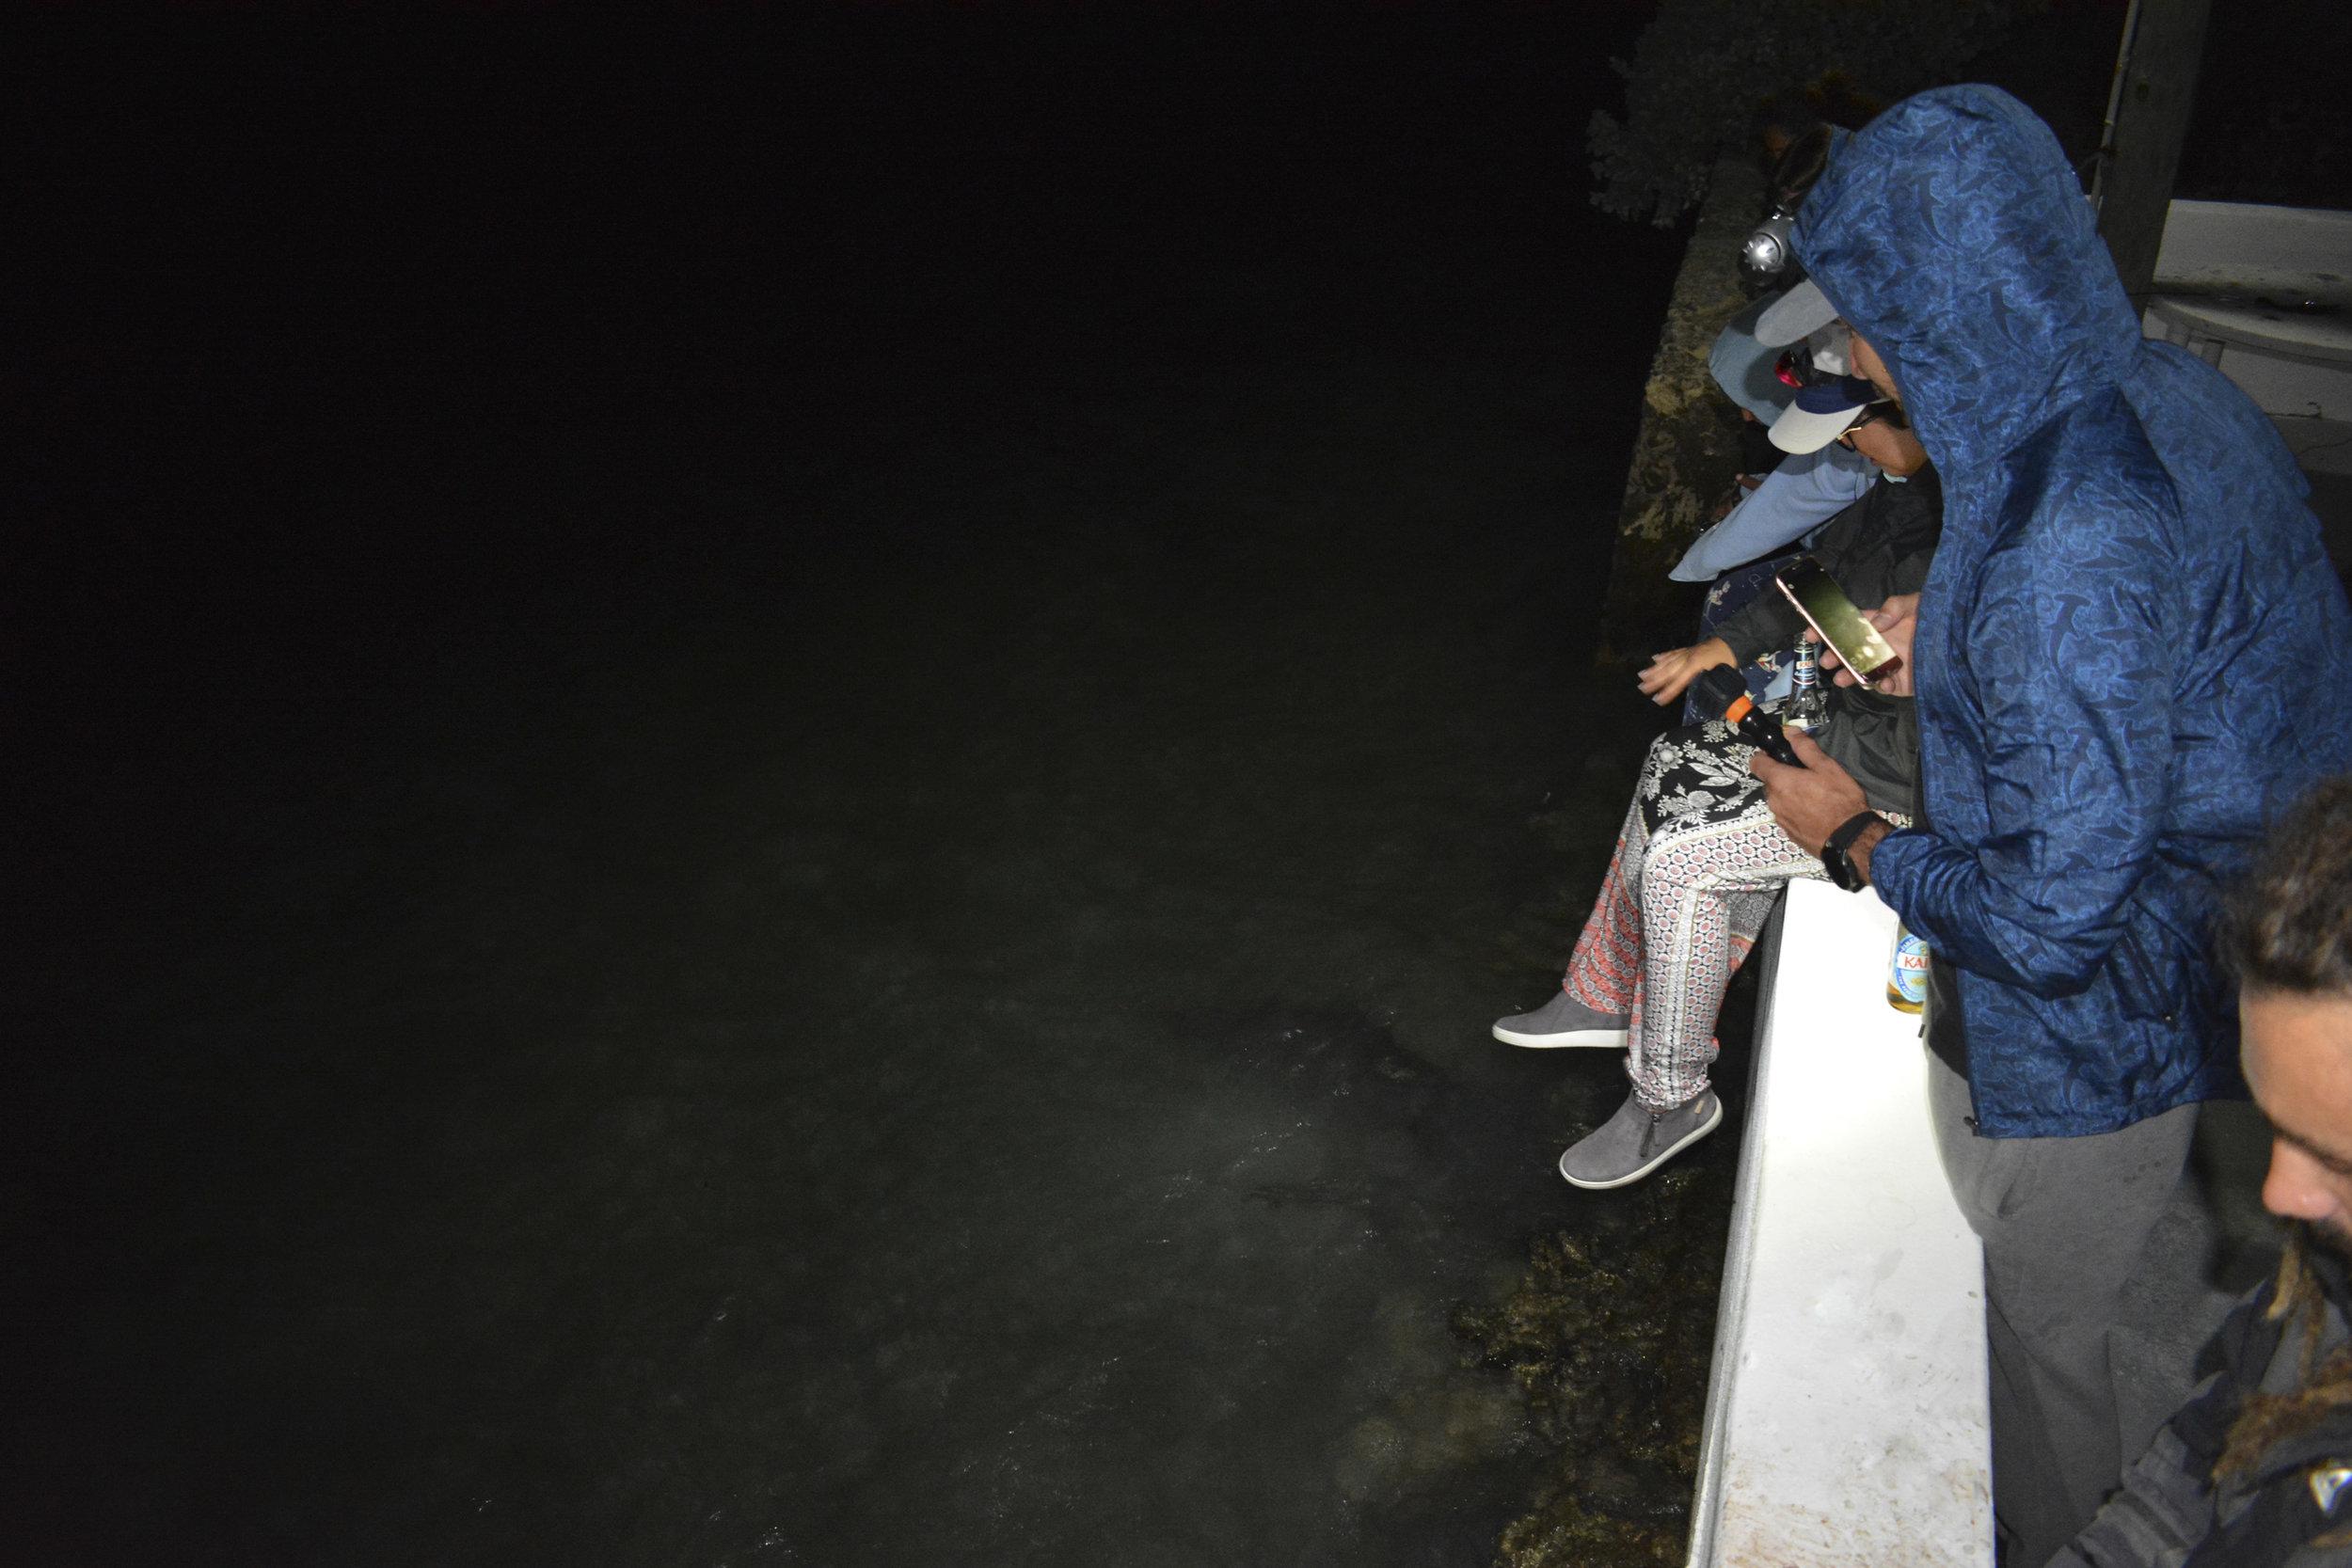 Guests enjoy some nighttime lemon shark action!